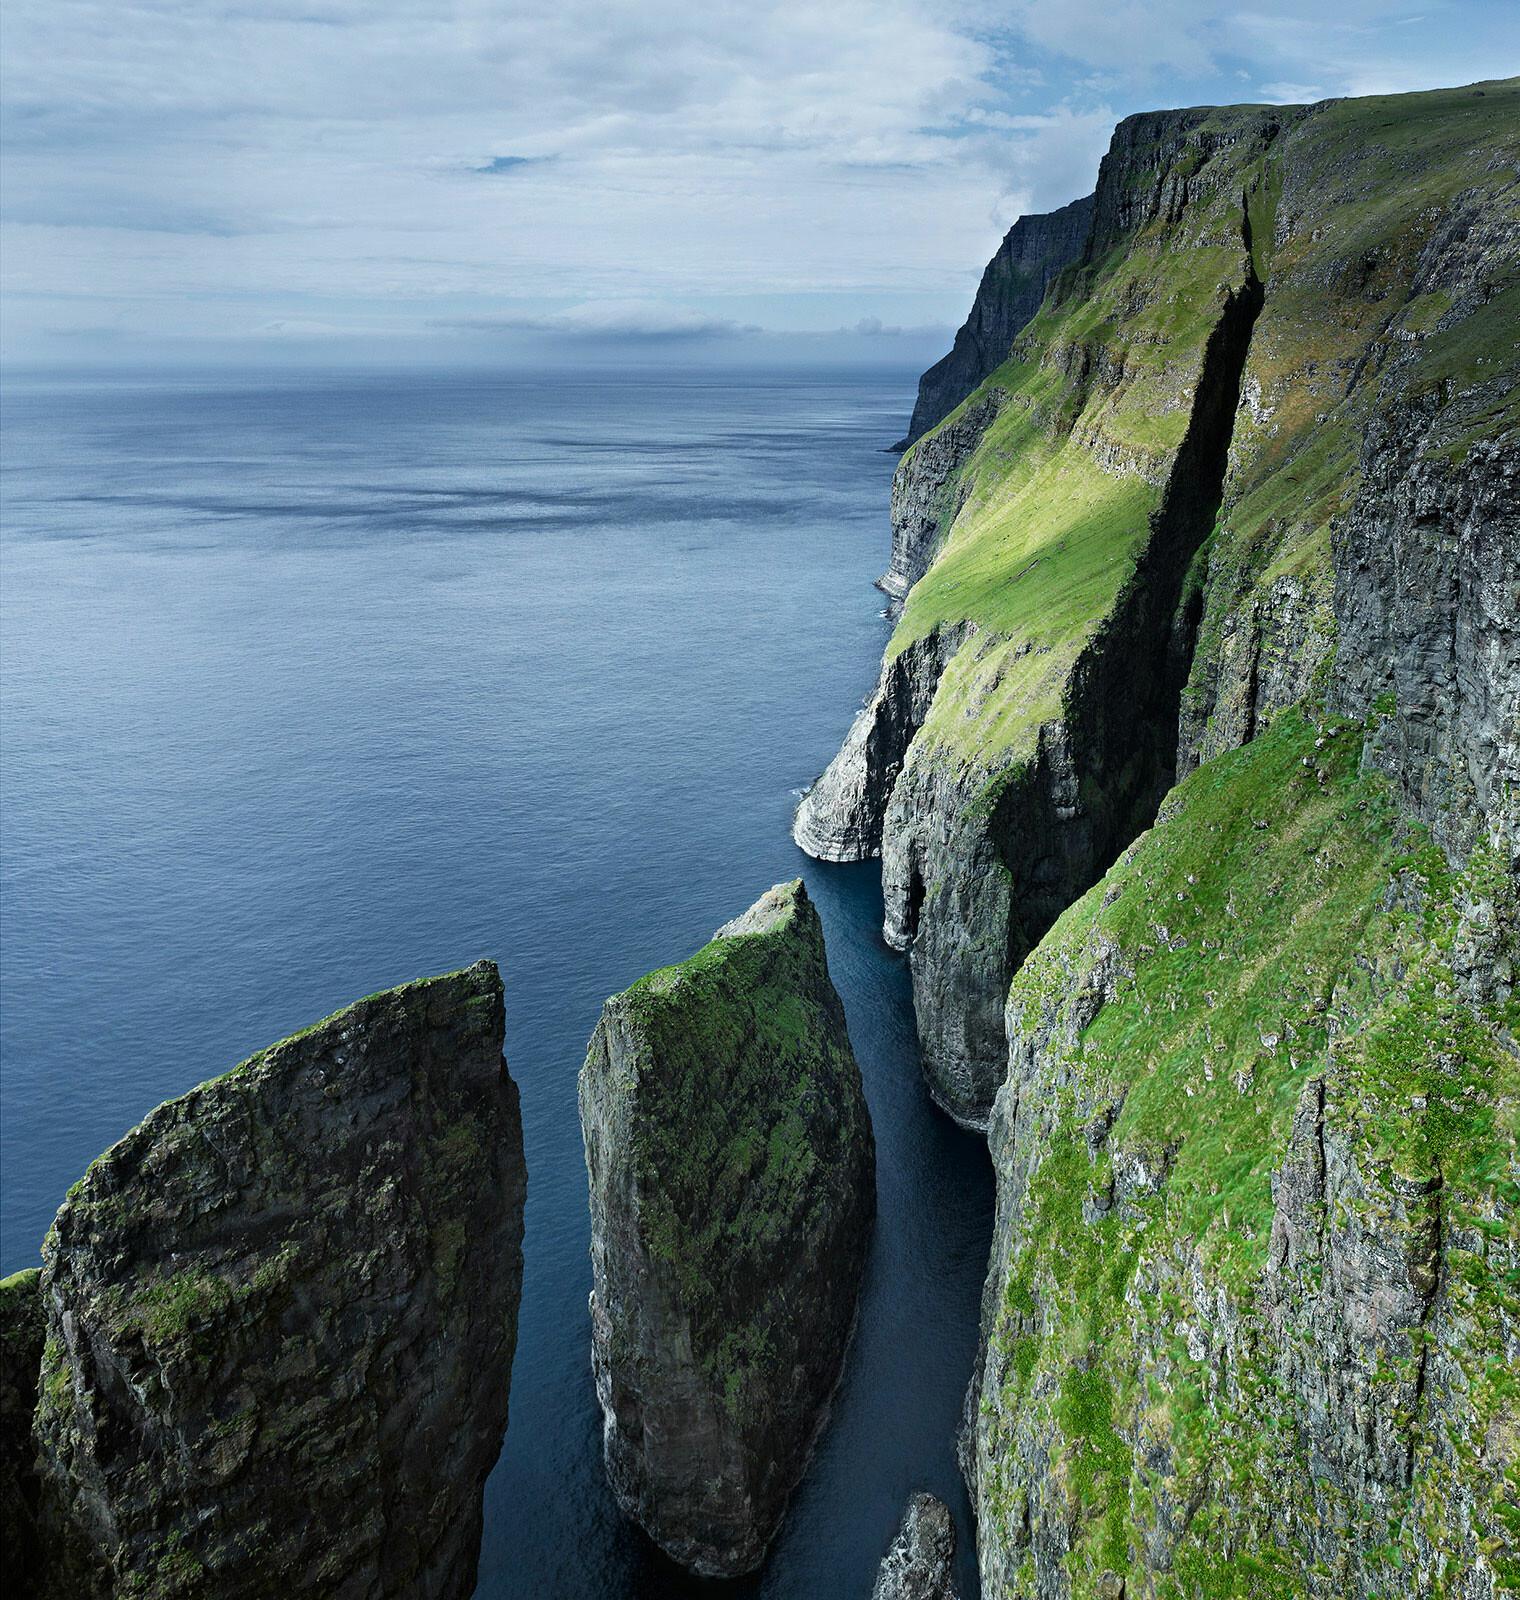 Sea stacks #2, Faroe Islands - Jonathan Andrew